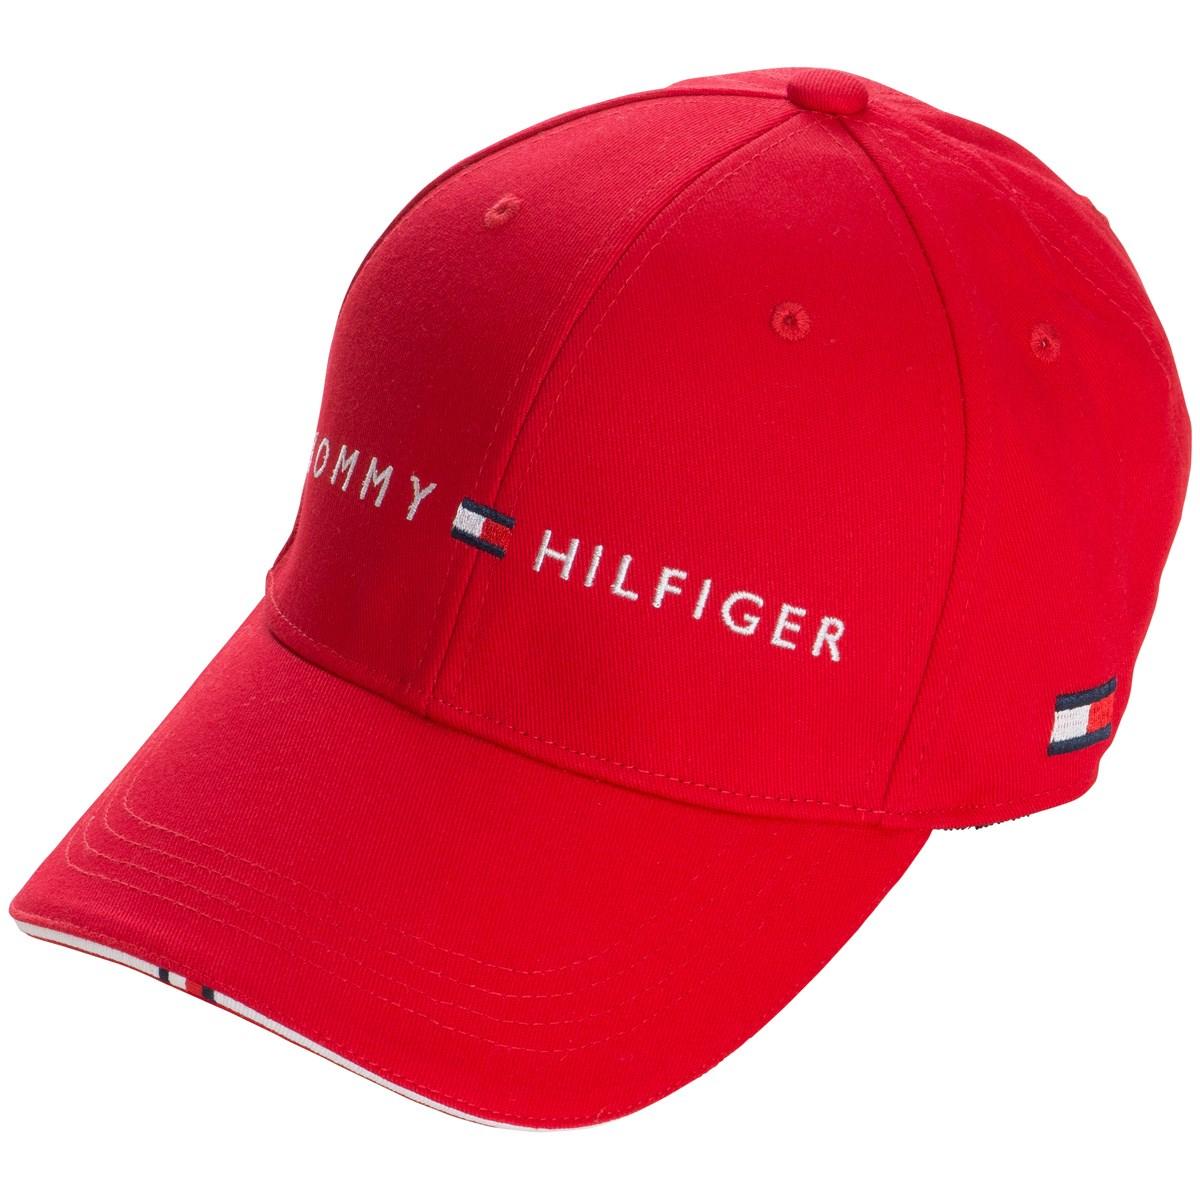 a7a7133d78d TH LOGO キャップ トミー ヒルフィガー ゴルフ TOMMY HILFIGER GOLF GDOゴルフショップ